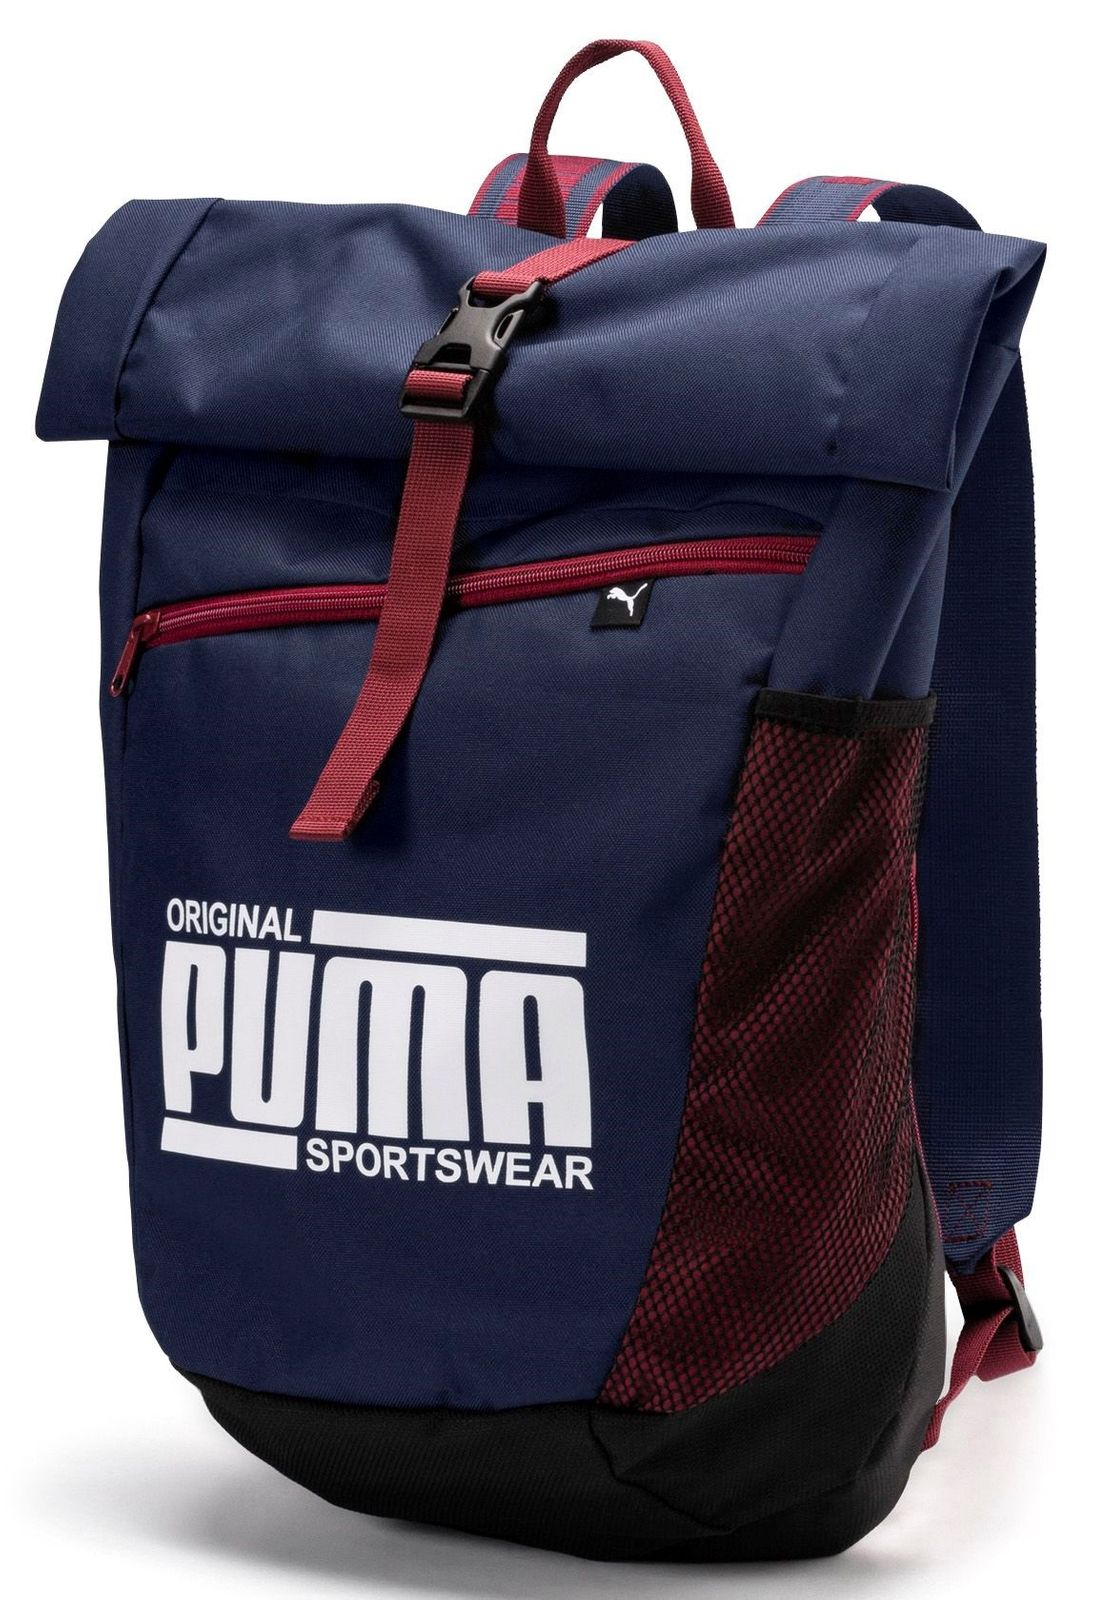 d4dedbdb4c12c PUMA Sole Backpack Rucksack Tasche Peacoat Blau Rot Neu